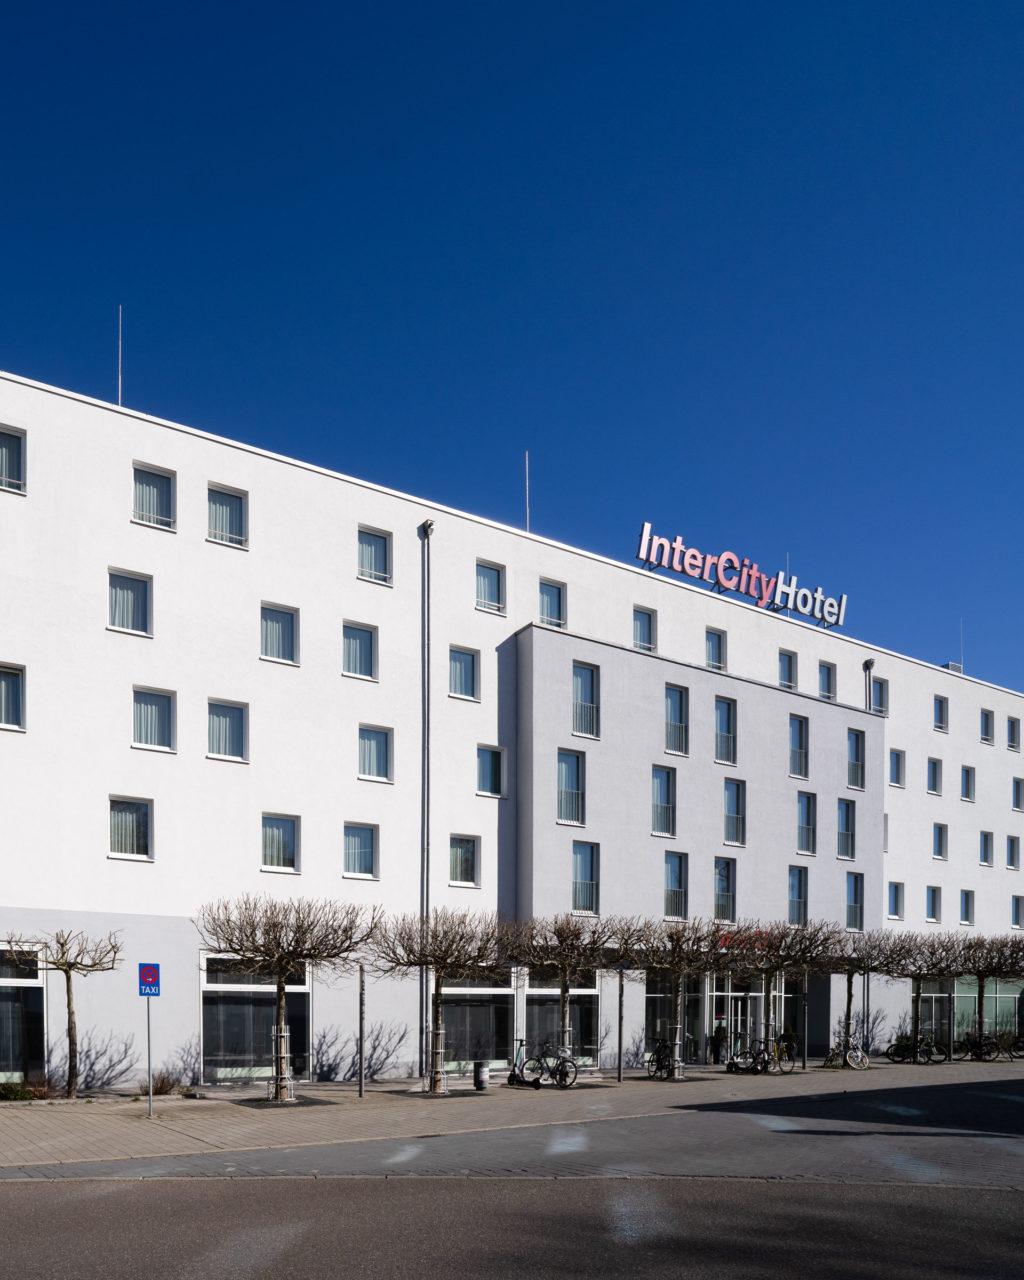 AWETHA_IntercityHotel-Ingolstadt_Gewährleistungsmanagement-01119-1